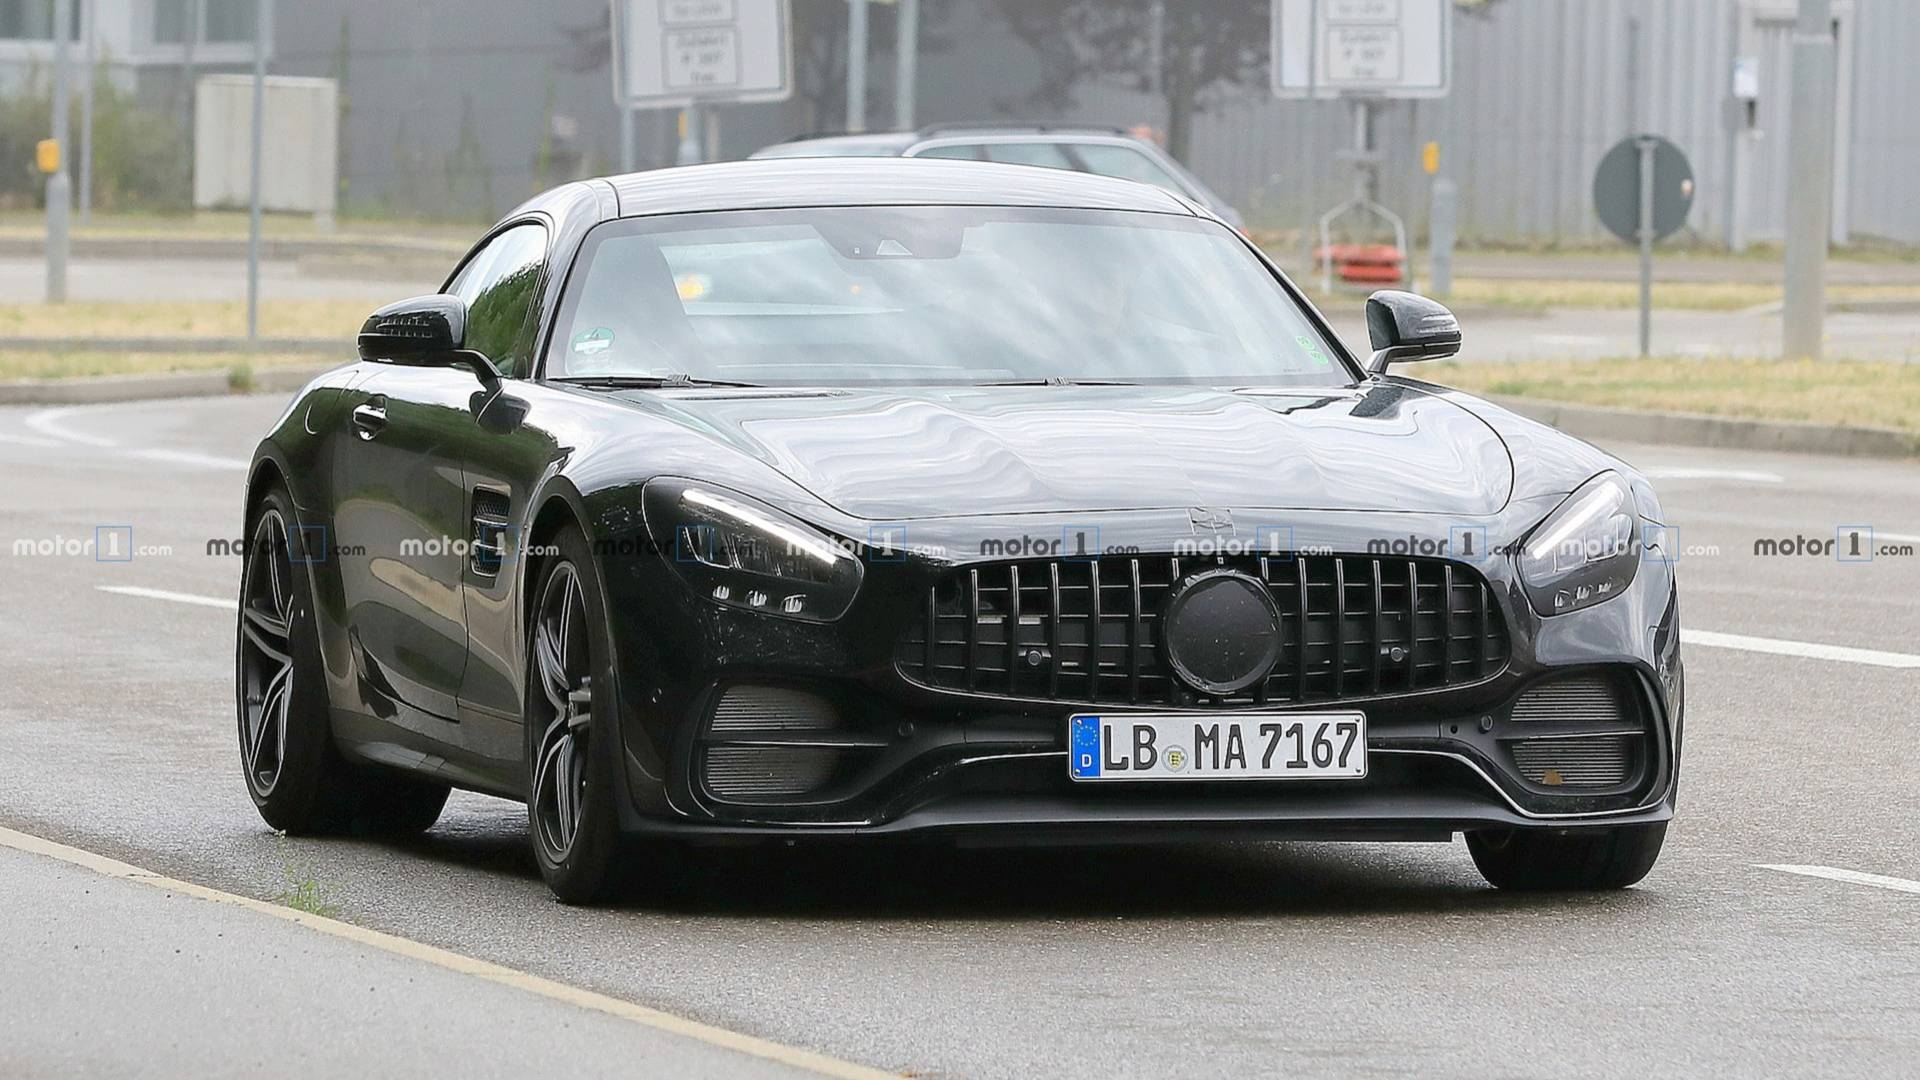 2014 - [Mercedes-AMG] GT [C190] - Page 30 Mercedes-amg-gt-facelift